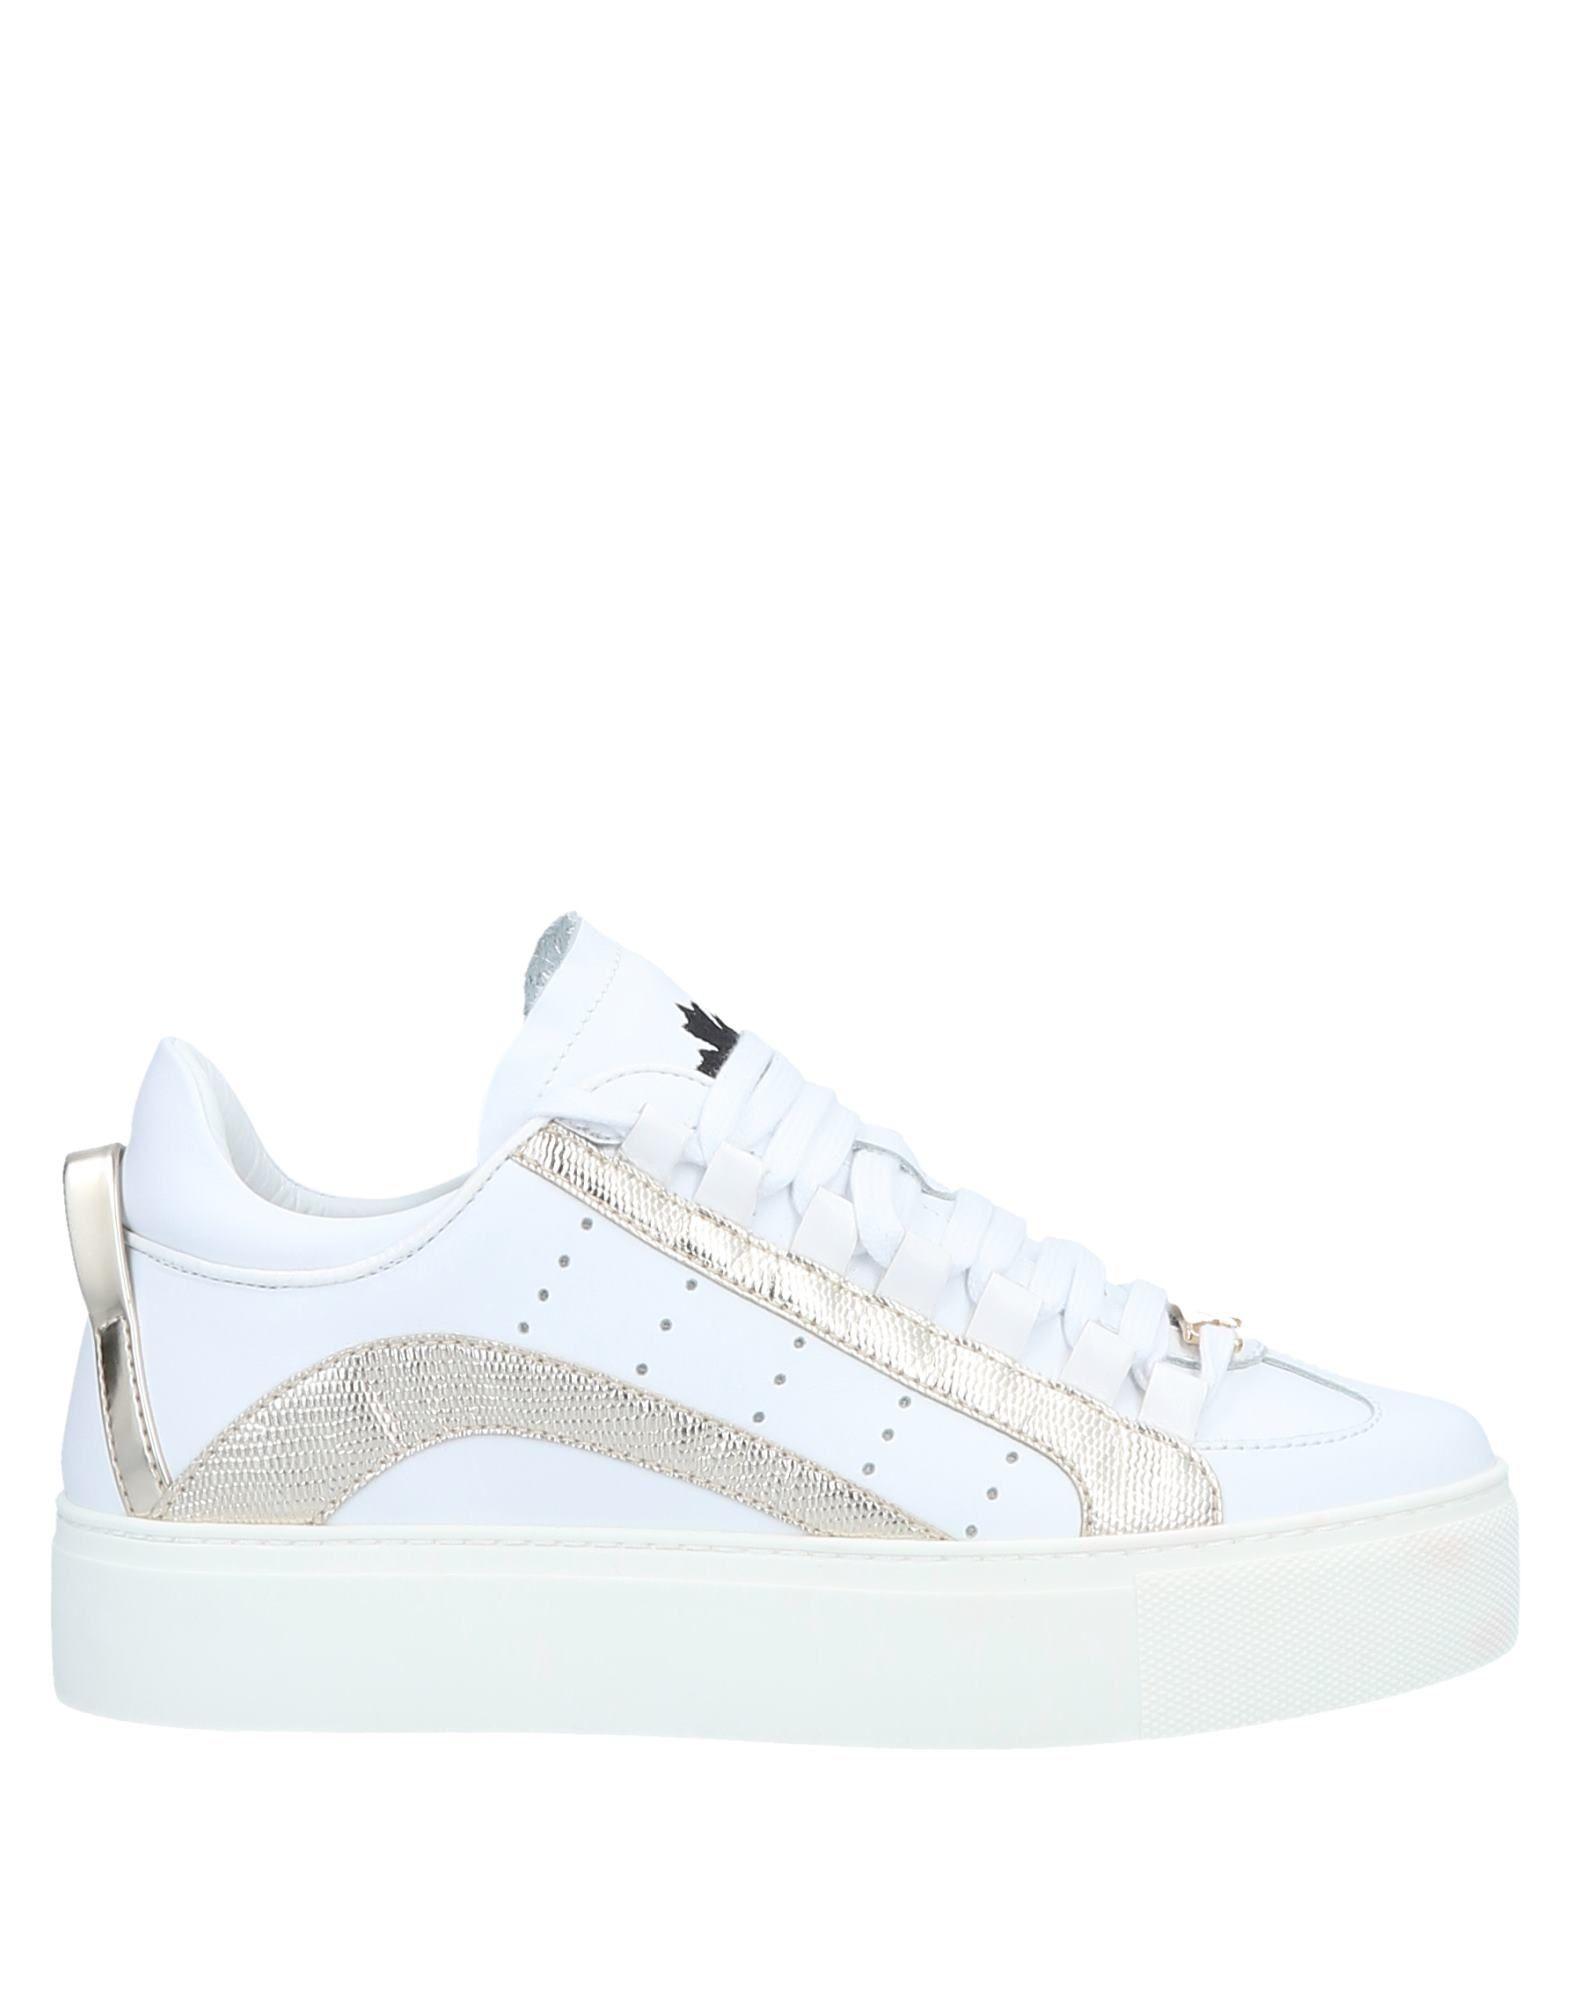 Rabatt Schuhe Sneakers Dsquared2 Sneakers Schuhe Damen  11568424UB ae3913